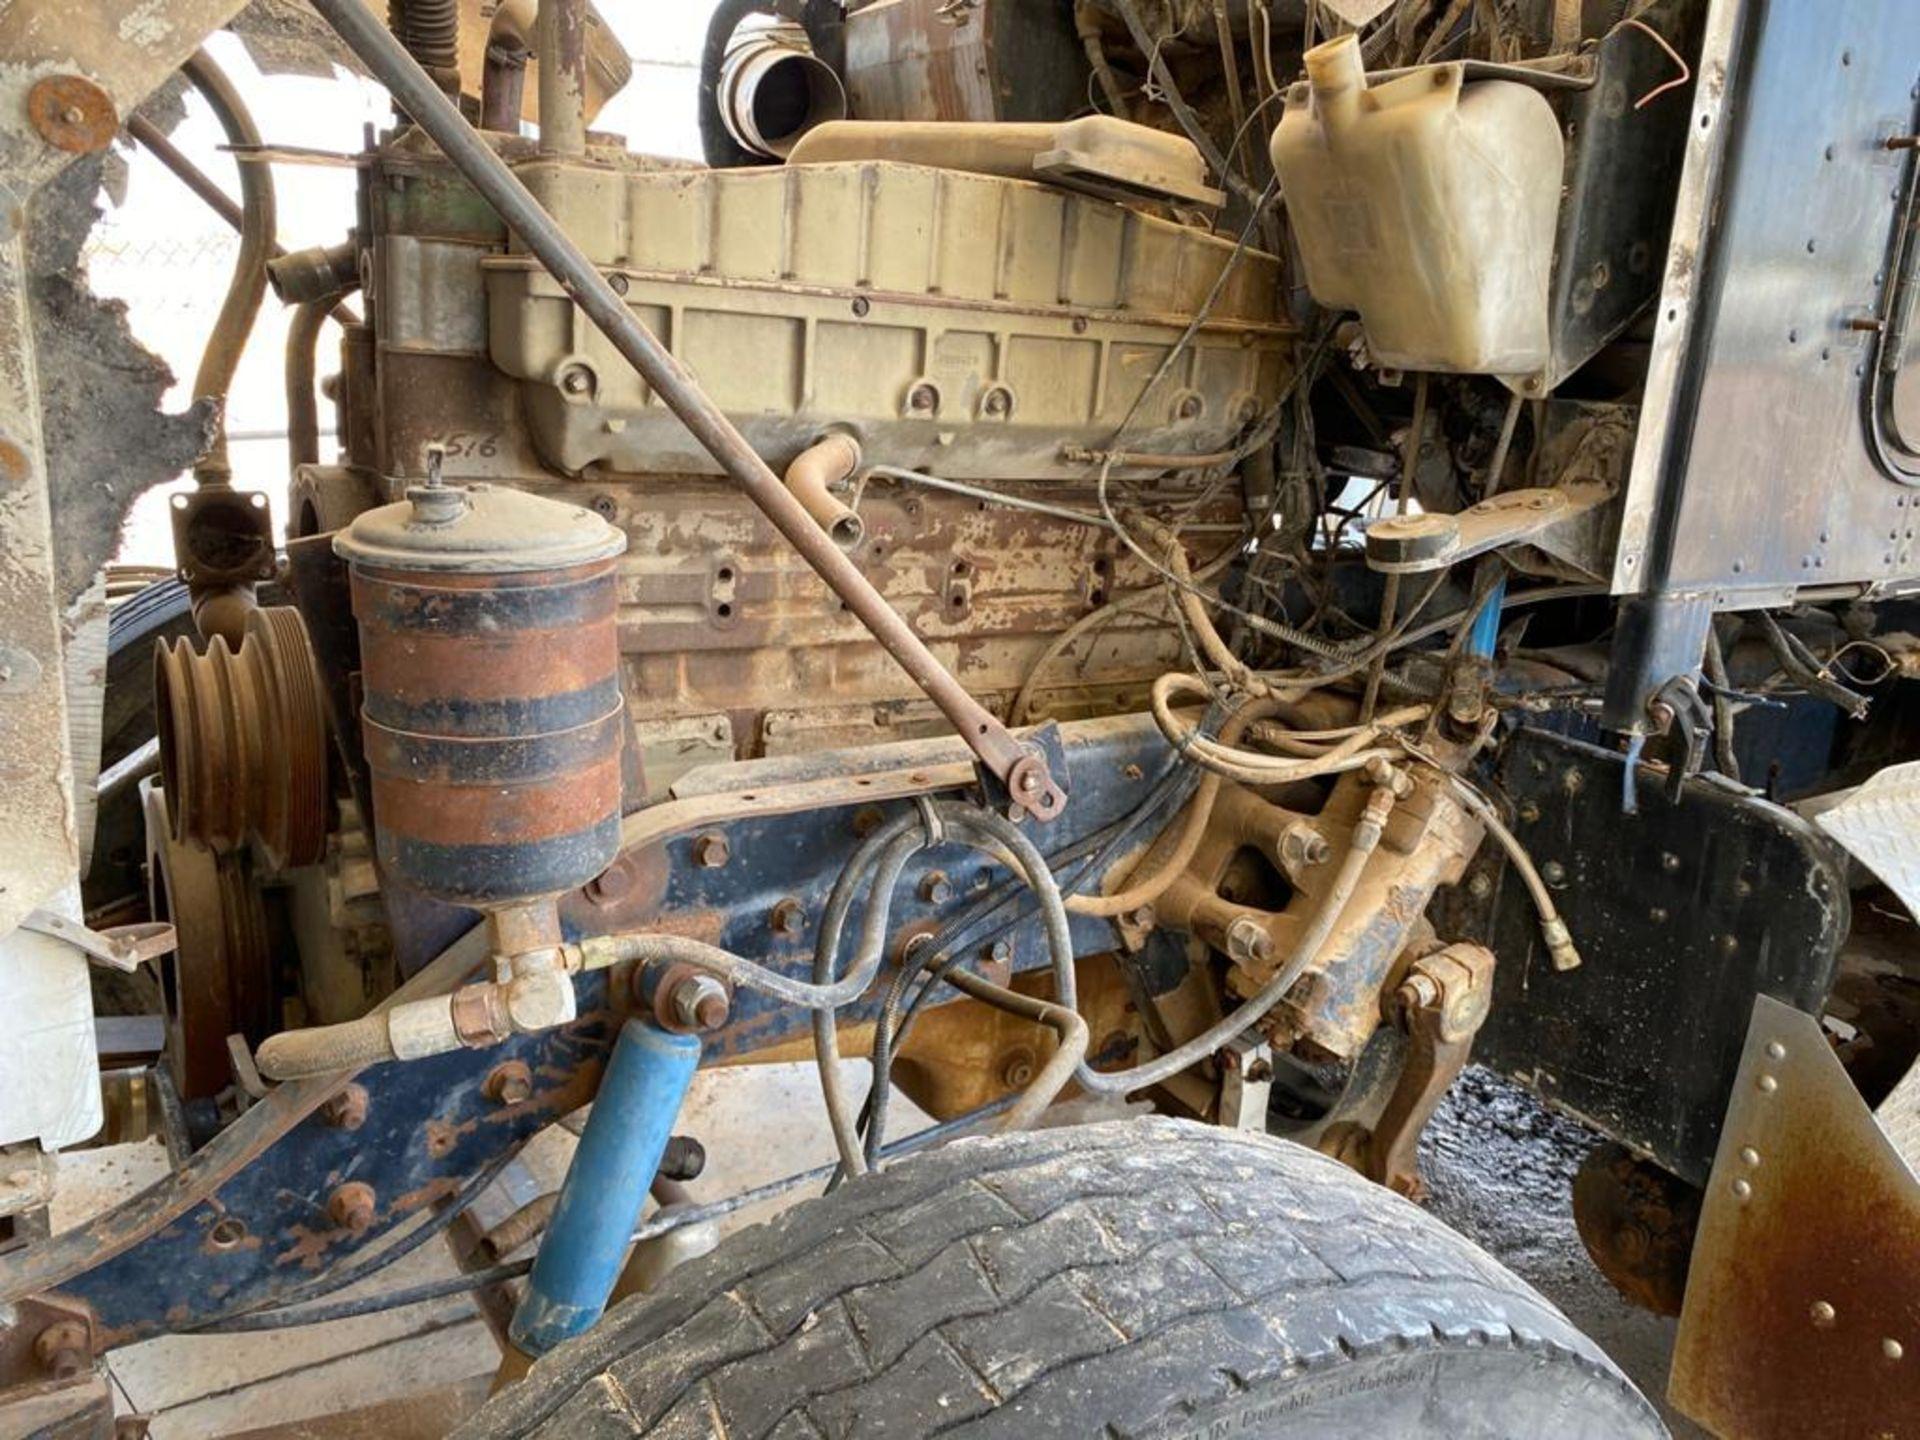 1983 Kenworth Dump Truck, standard transmission of 10 speeds, with Cummins motor - Image 42 of 68